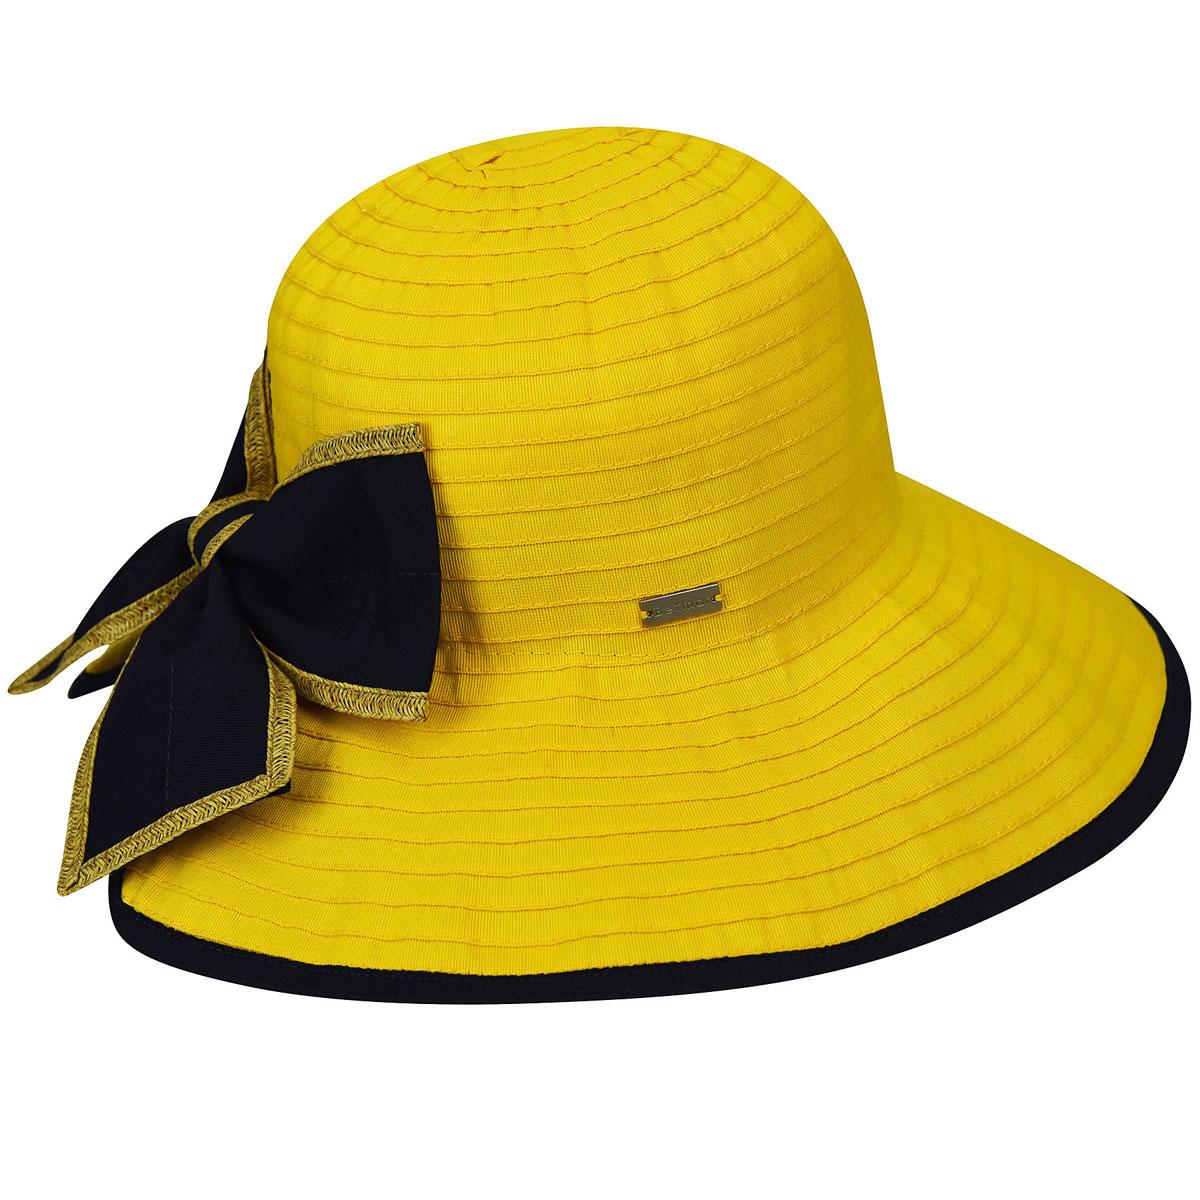 Betmar Malta Ribbon Wide Brim Hat in Sunshine